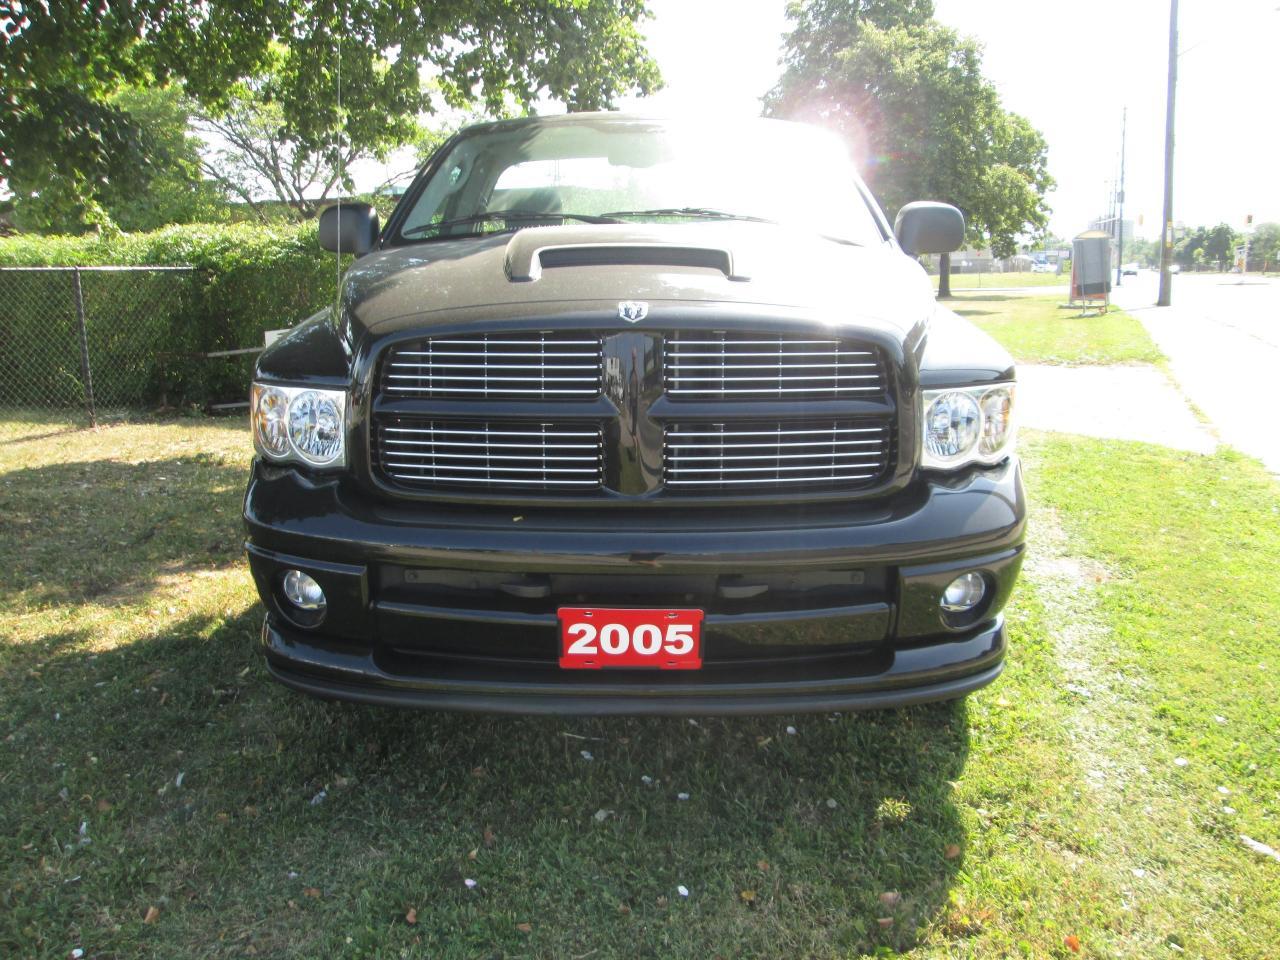 2005 Dodge Ram 1500